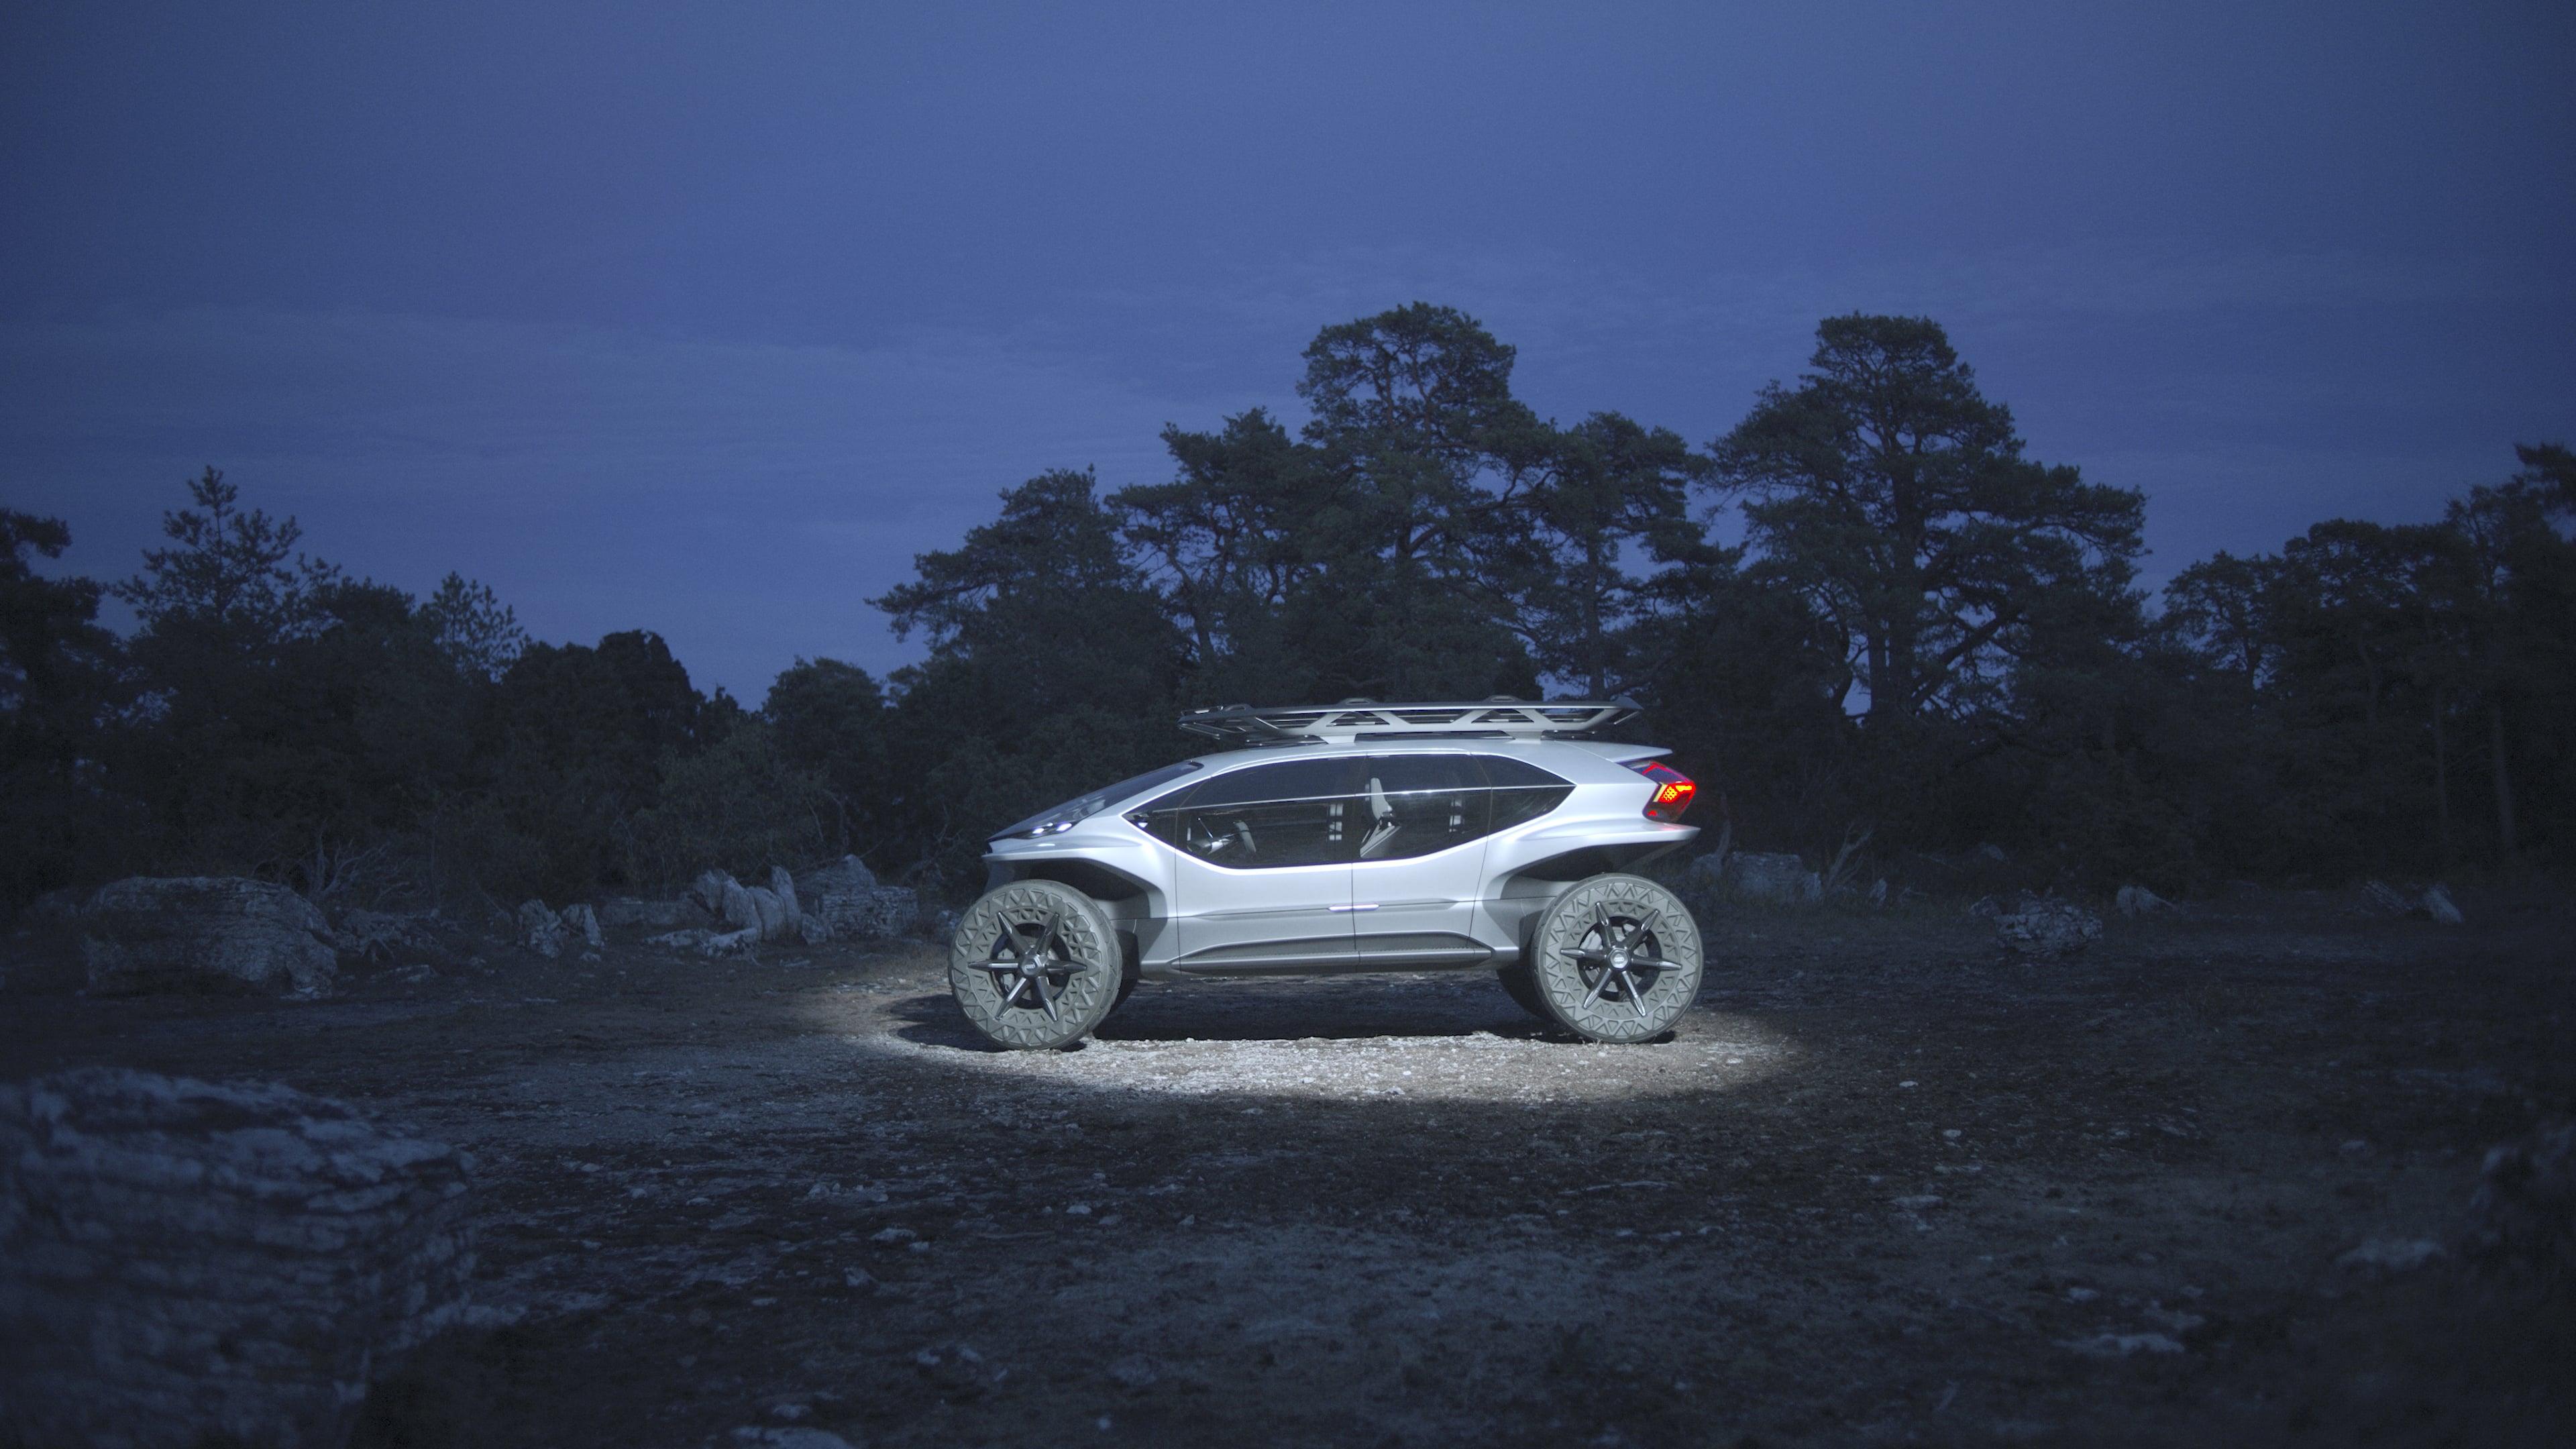 Audi - AI:TRAIL Quattro